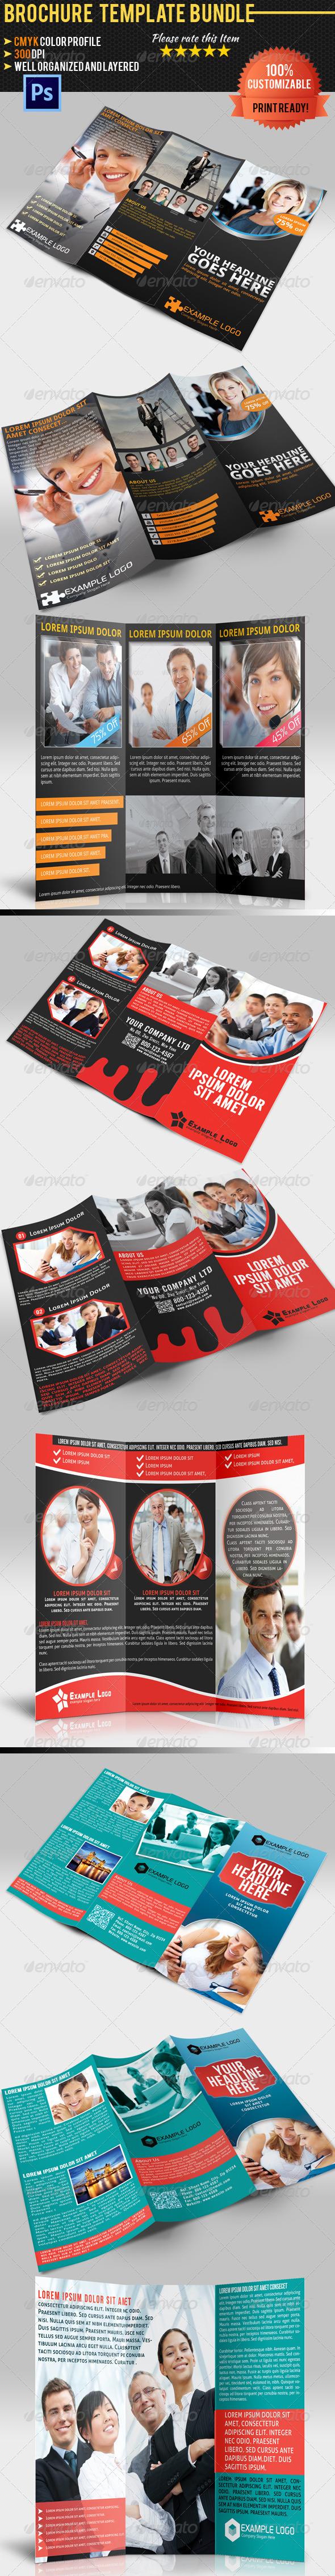 GraphicRiver Tri-Fold Corporate Business Brochure Bundle 02 5100880